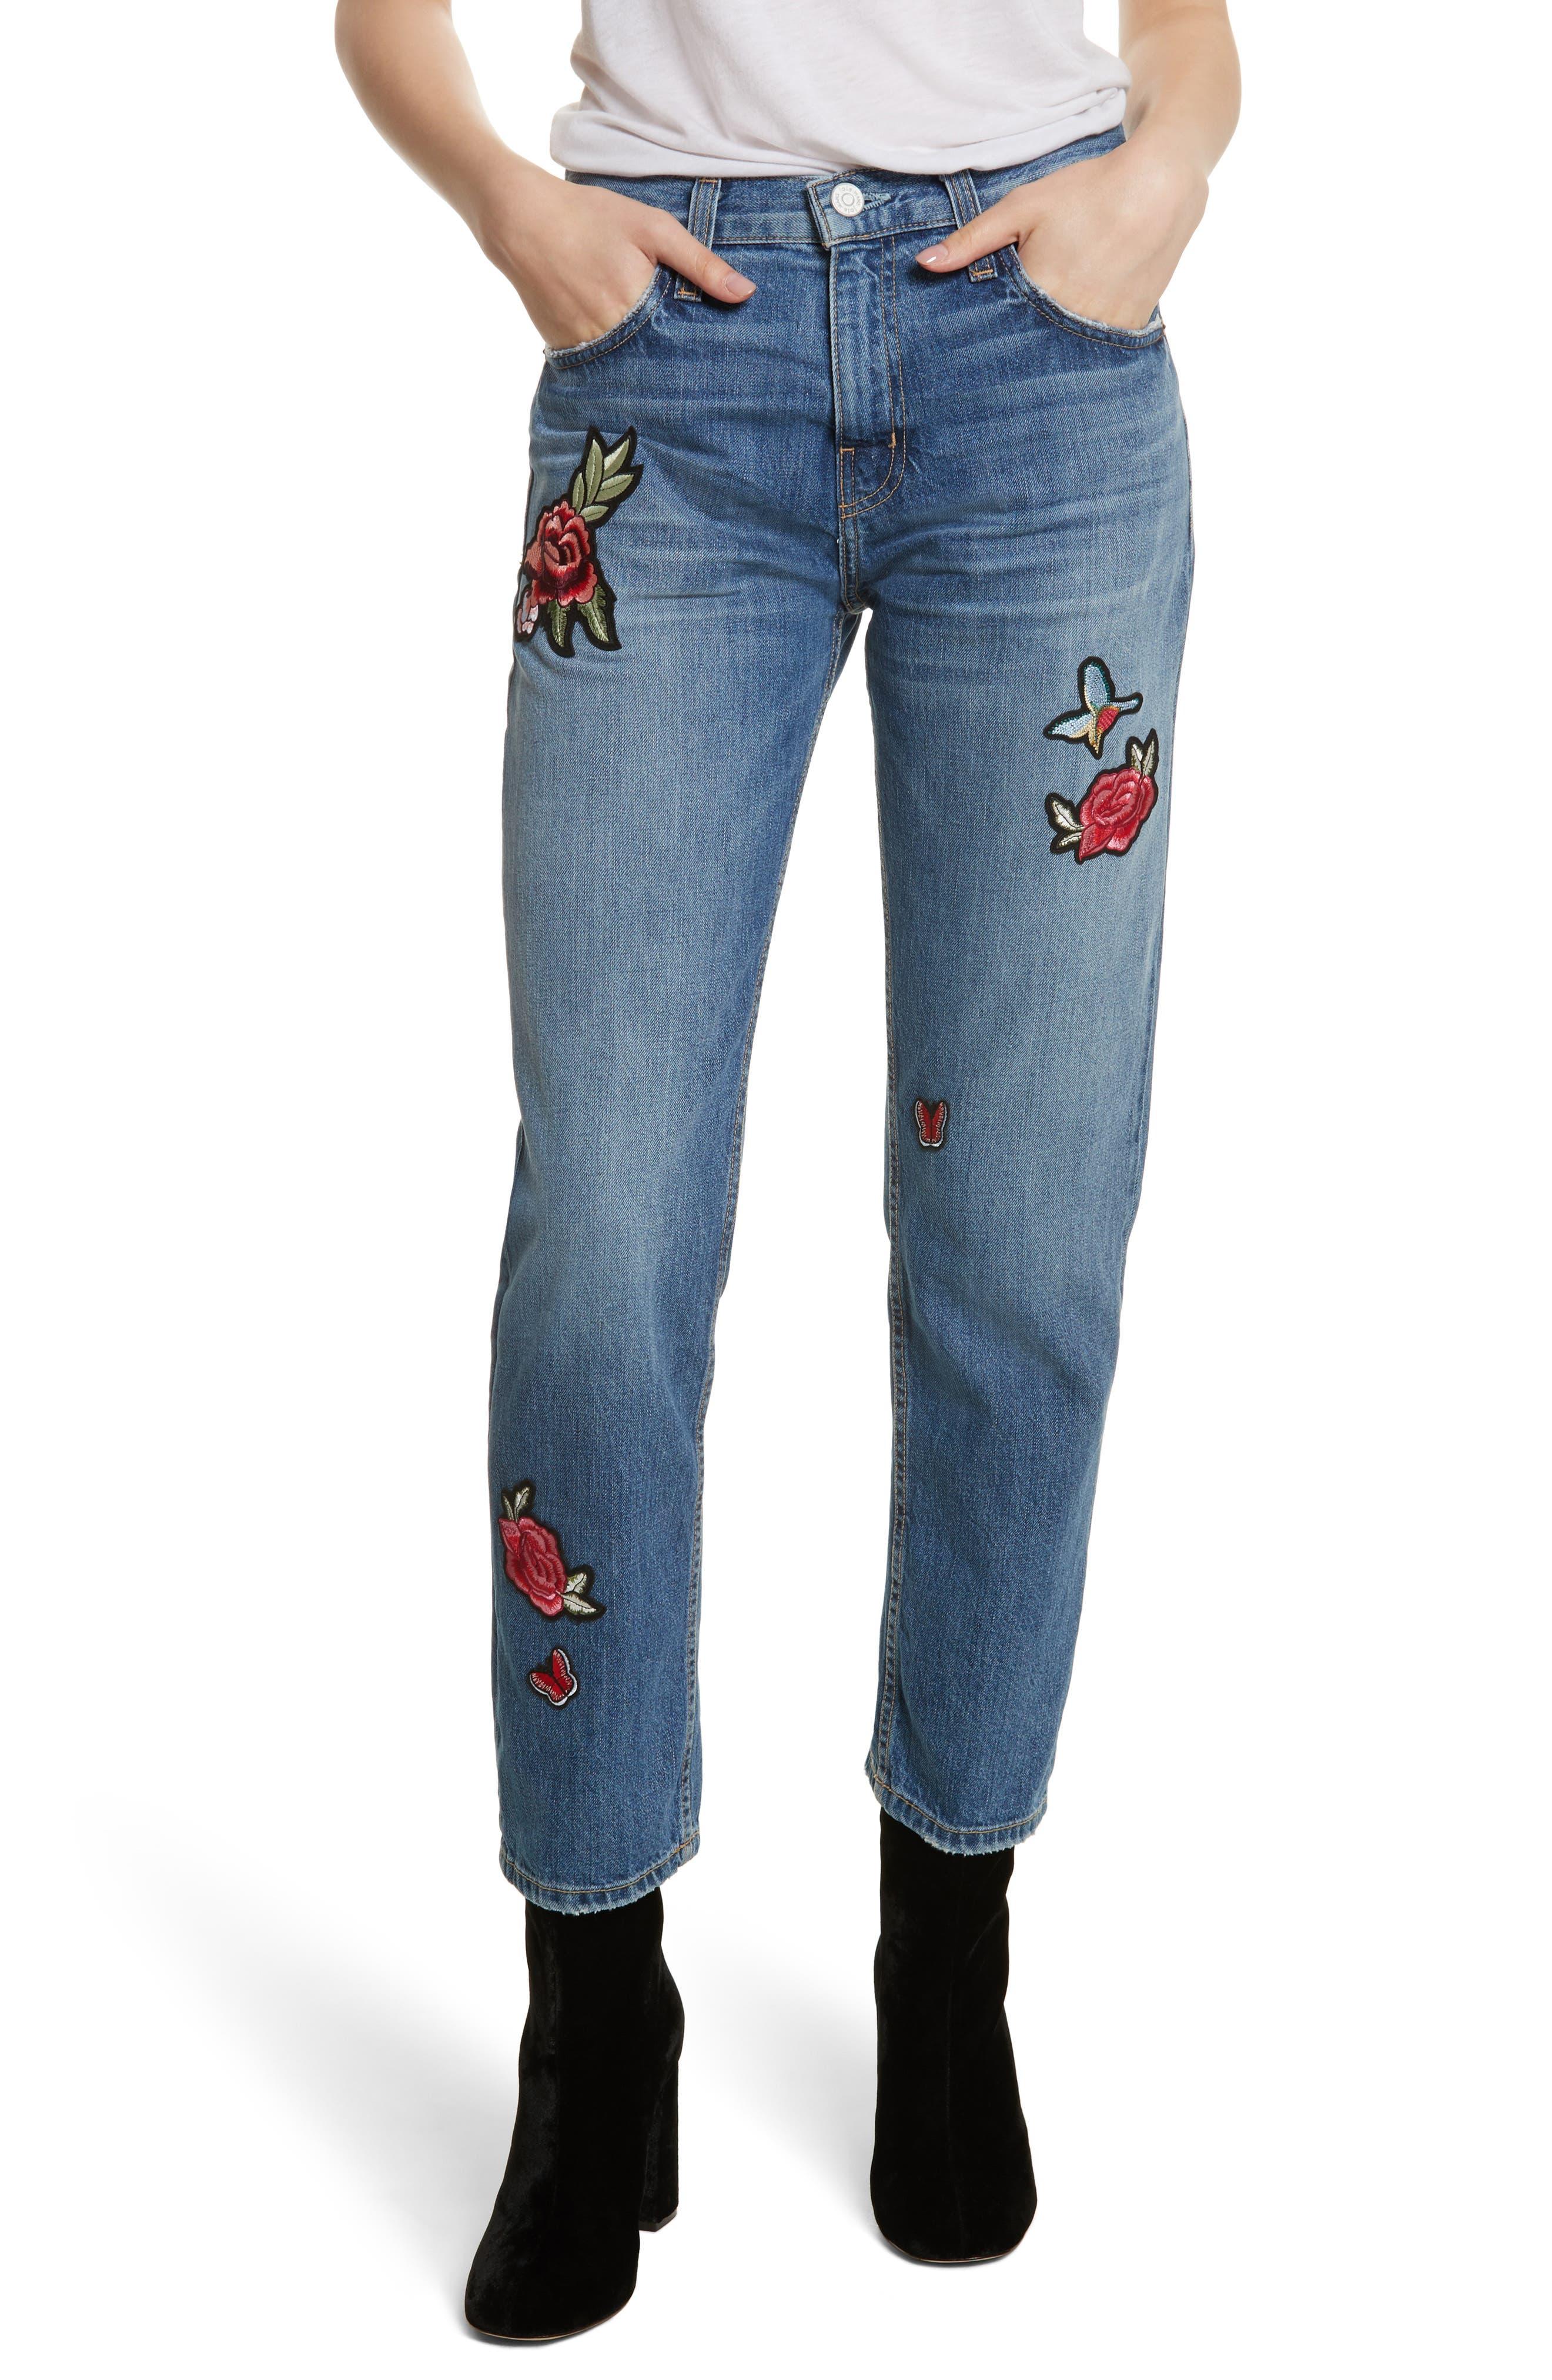 Alternate Image 1 Selected - Joie Josie Jeans (Hotel California)